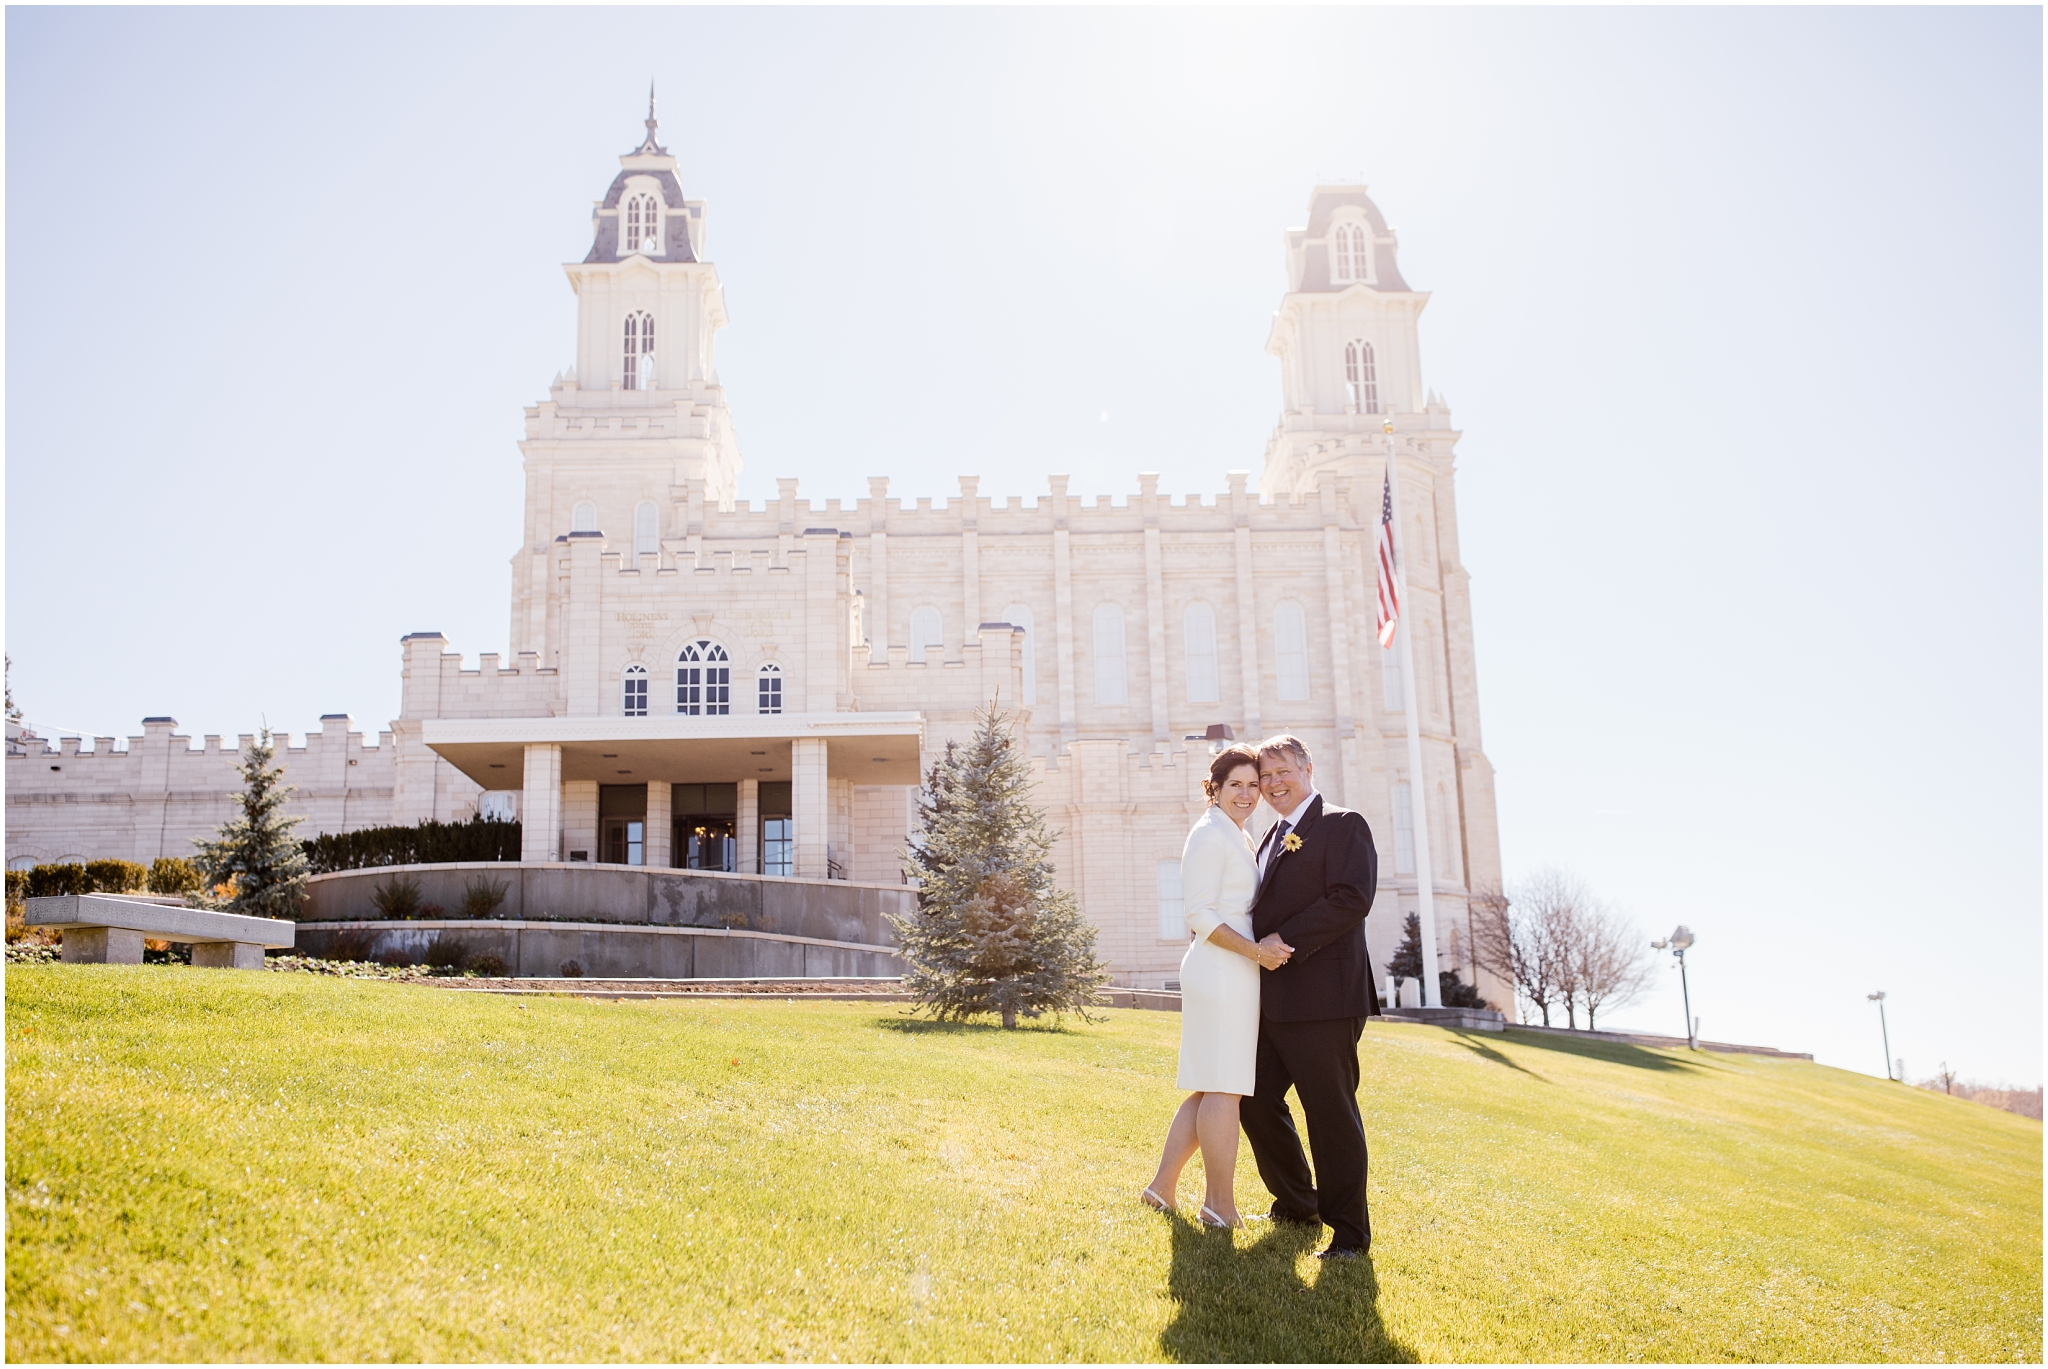 PDWeddingDay-133_Lizzie-B-Imagery-Utah-Wedding-Photographer-Salt-Lake-City-Park-City-Utah-County-Manti-Temple.jpg